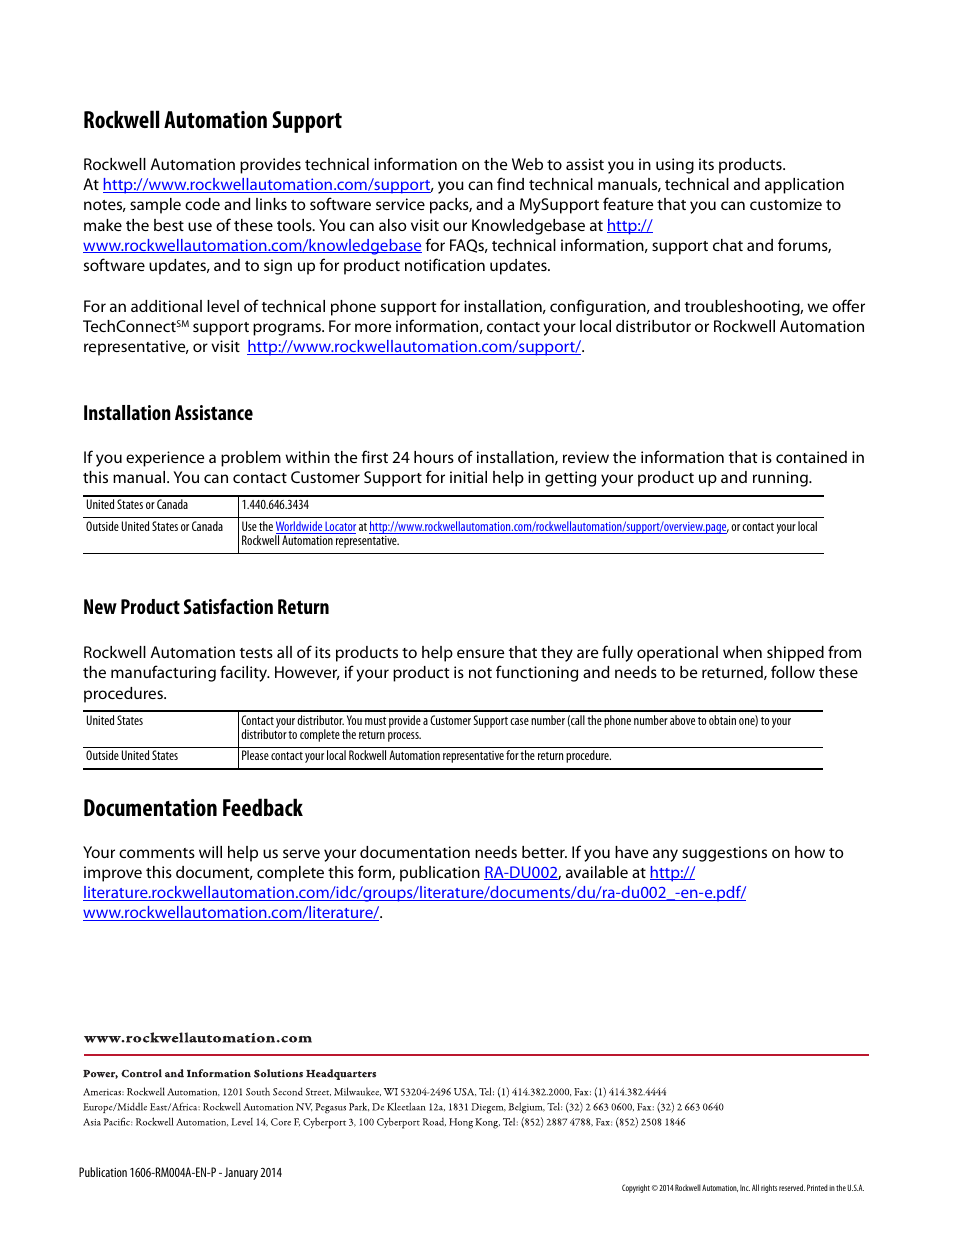 1606 back rockwell automation support documentation feedback rh manualsdir com Automated Mechanical Process Systems Inc Automated Mechanical Process Systems Inc